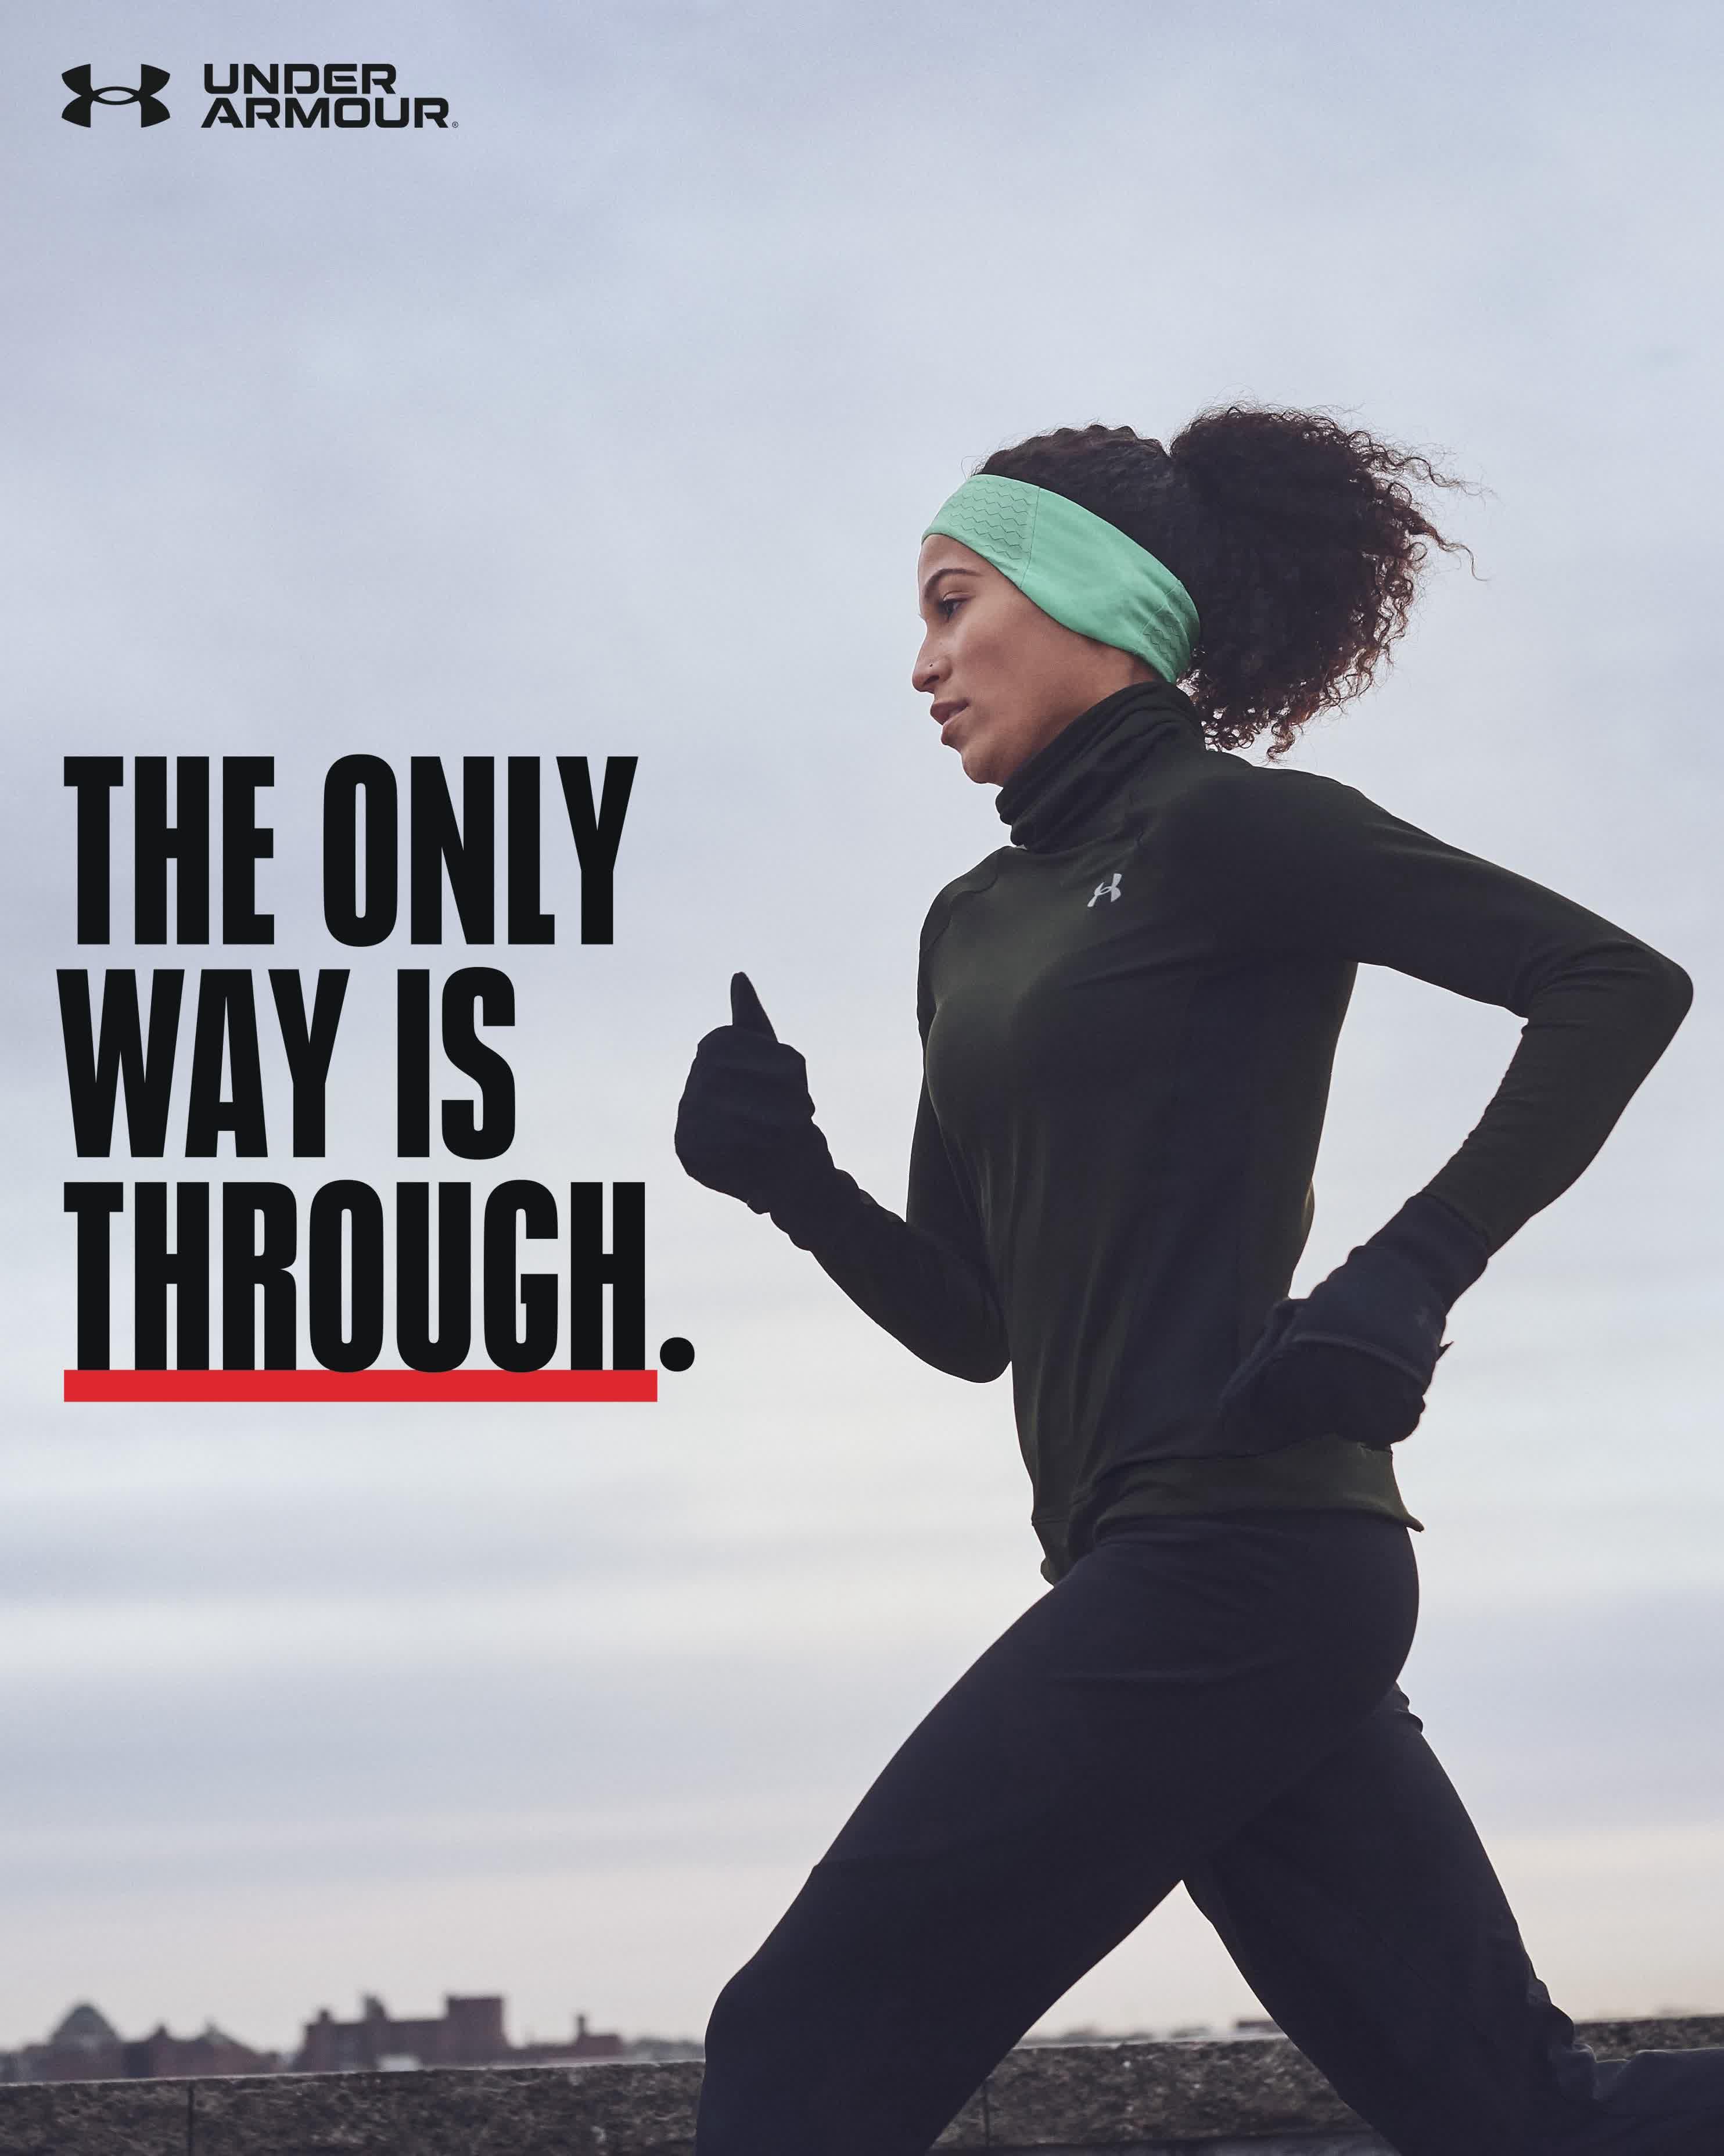 UA #TheOnlyWayIsThrough Campaign